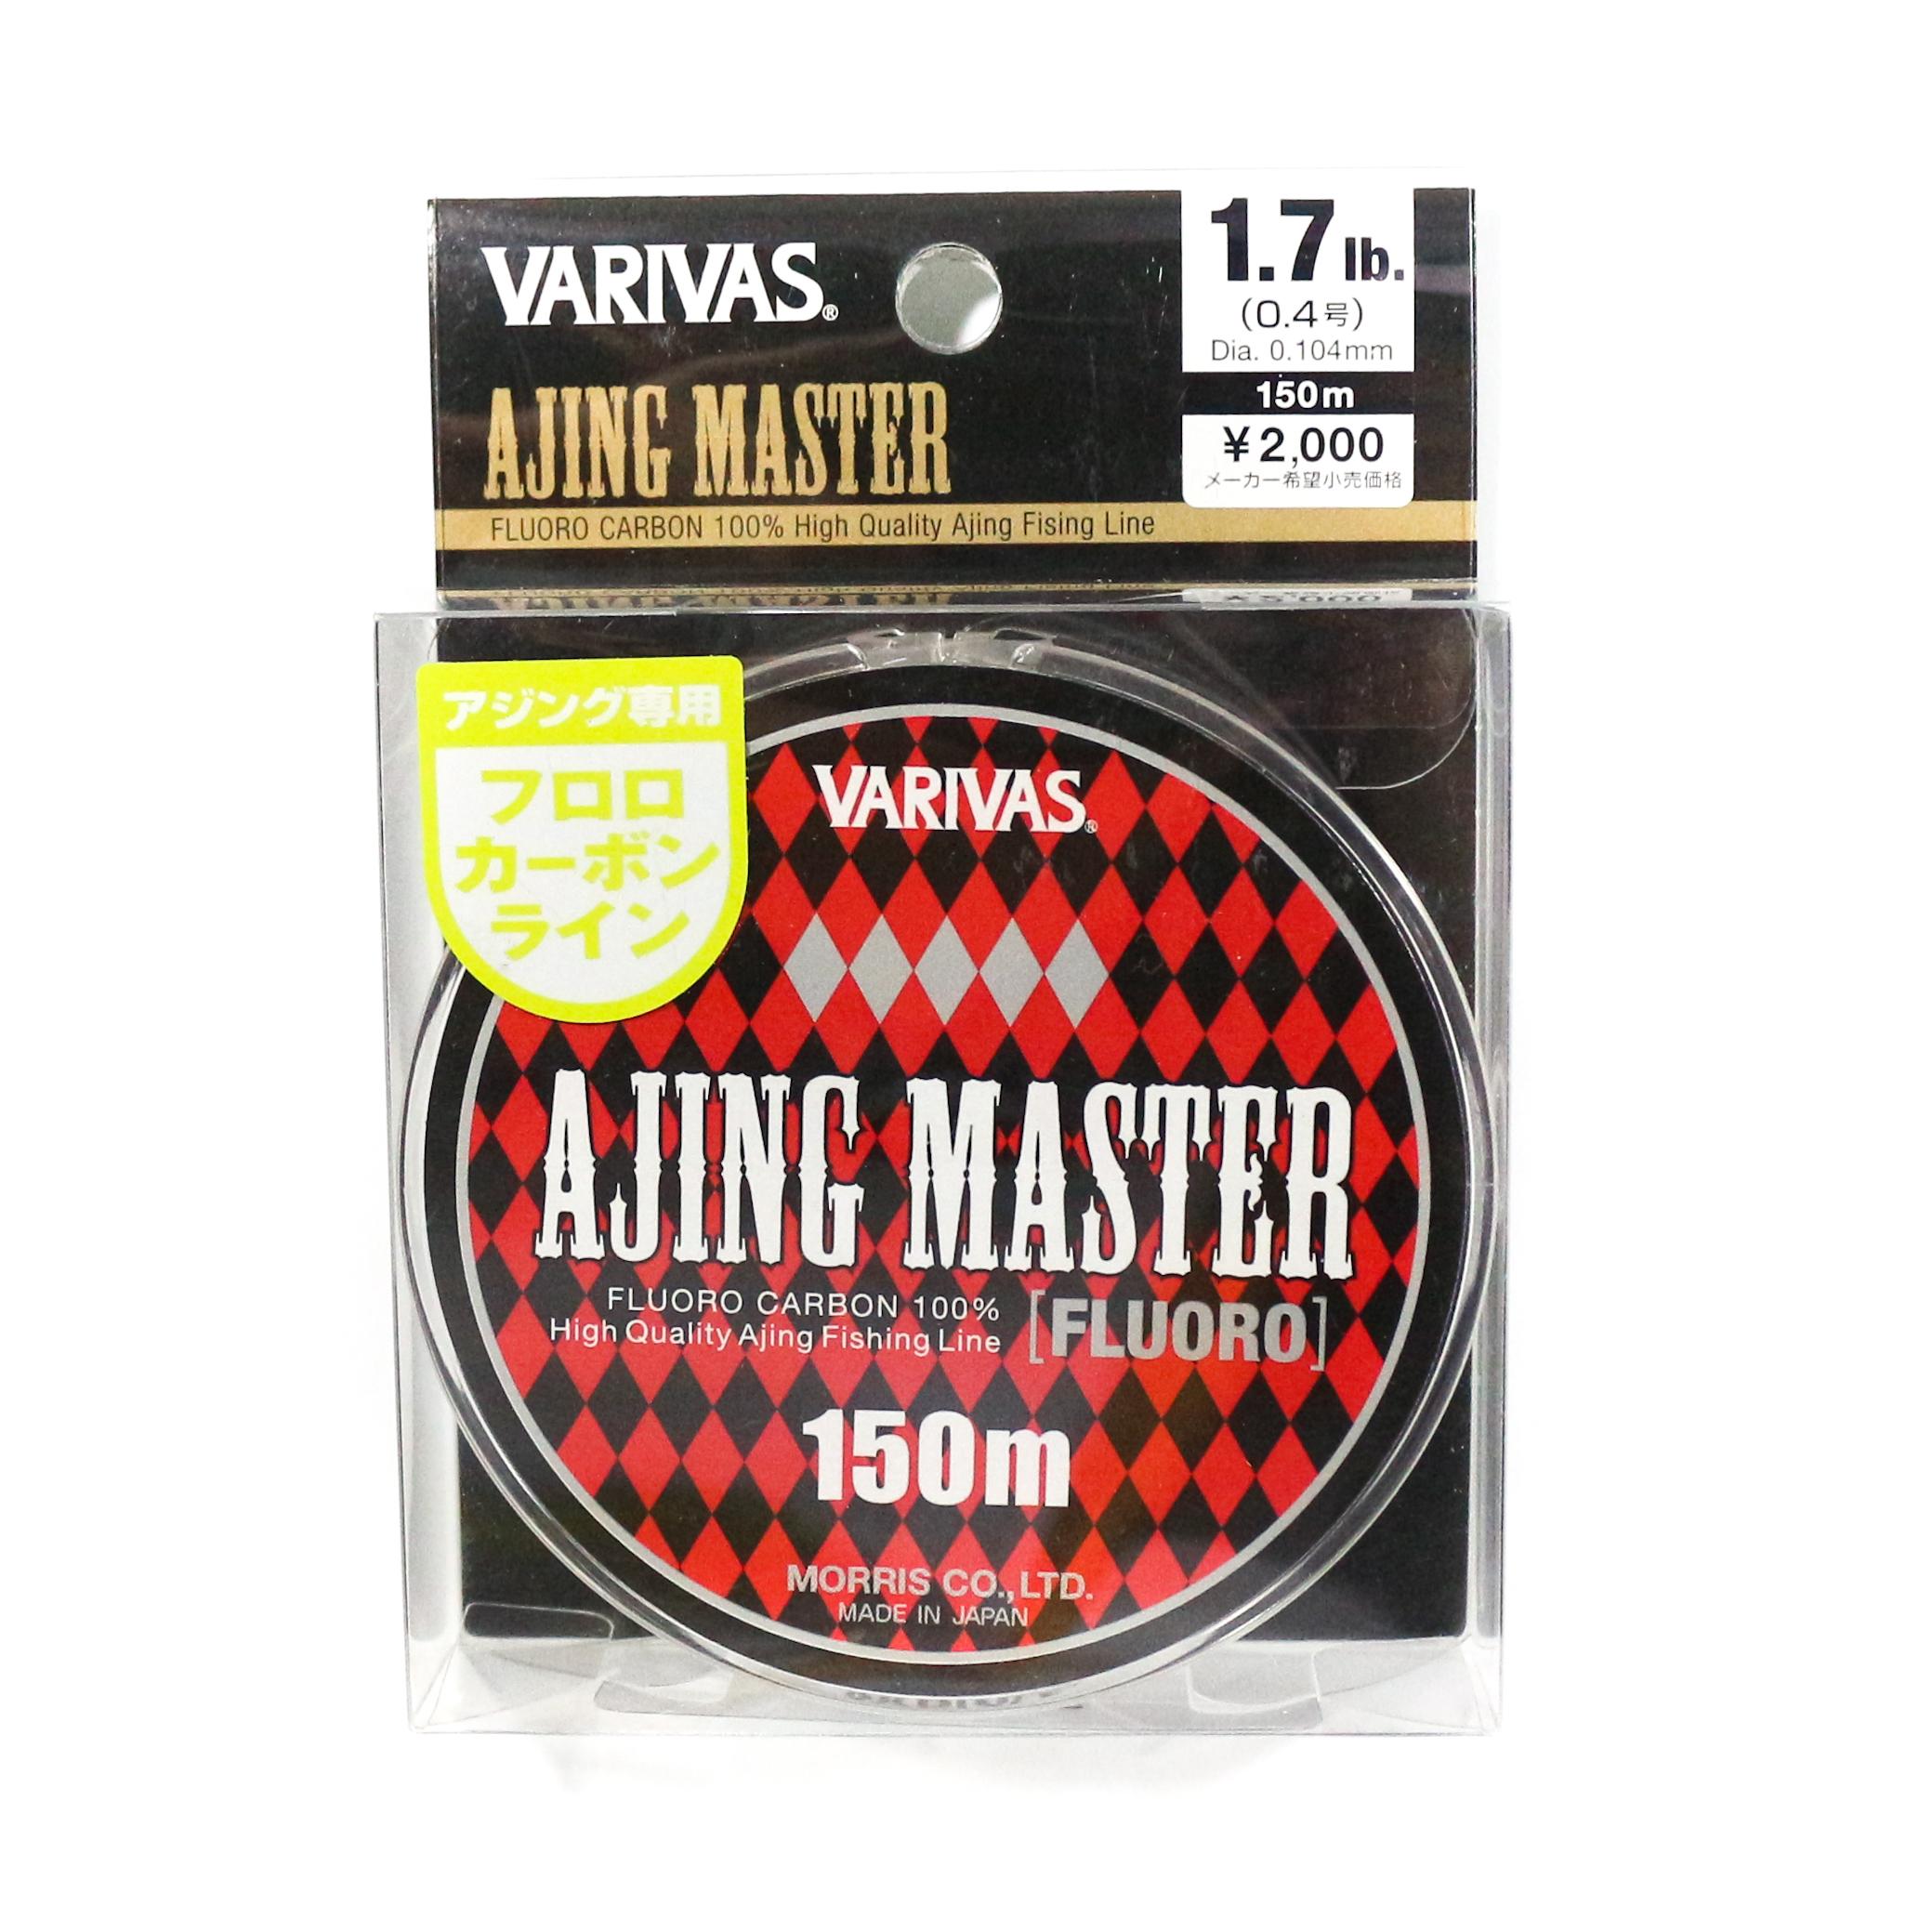 Sale Varivas Fluorocarbon Line Ajing Master 150m P.E 0.4, 1.7lb (5154)